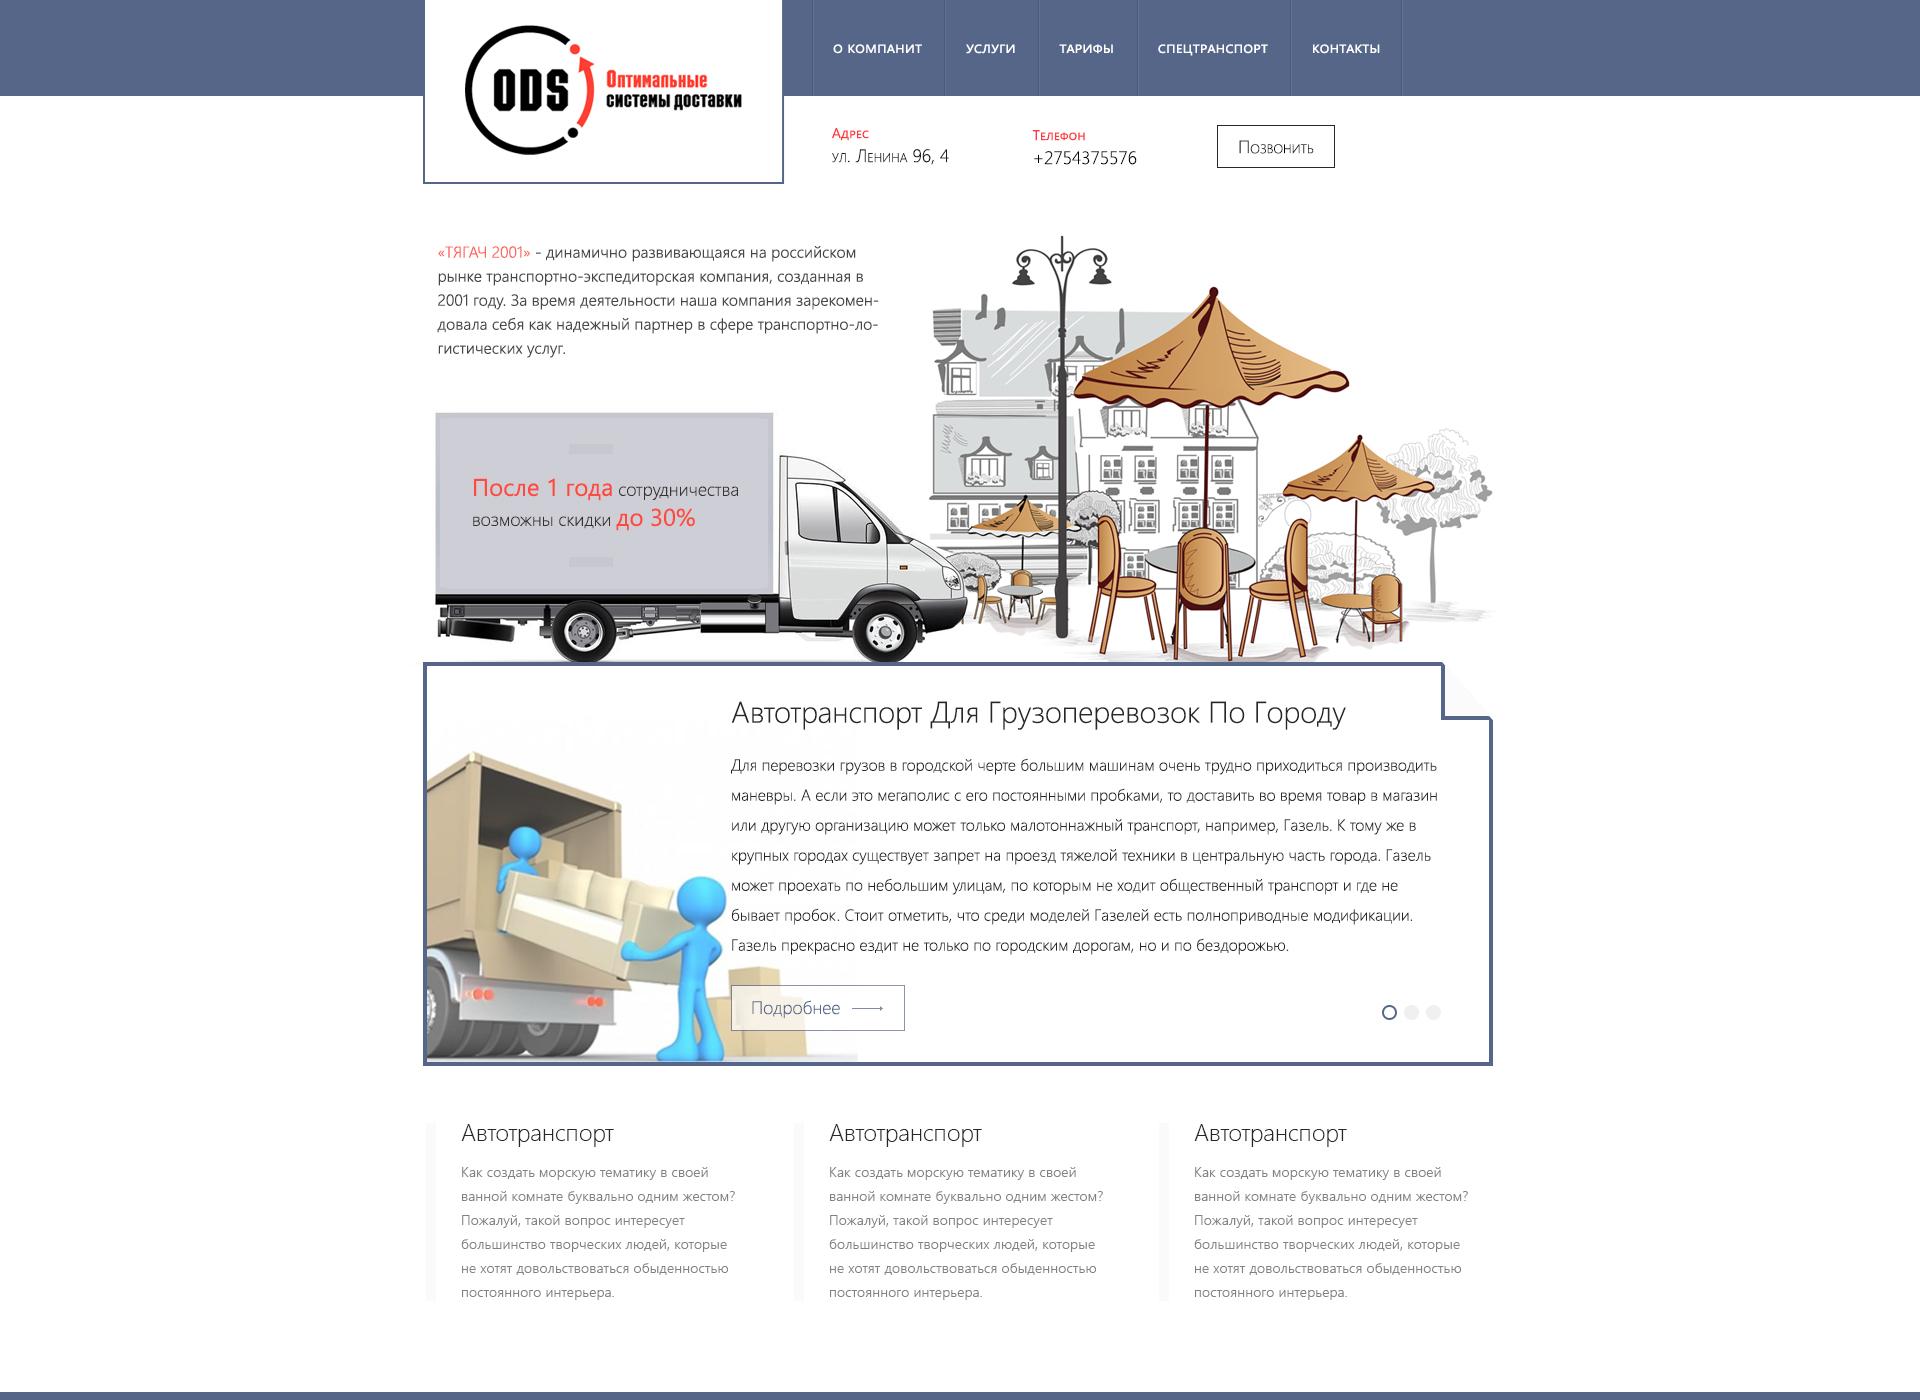 Дизайн сайта-визитки для транспортной компании фото f_15953d15f855edd8.jpg